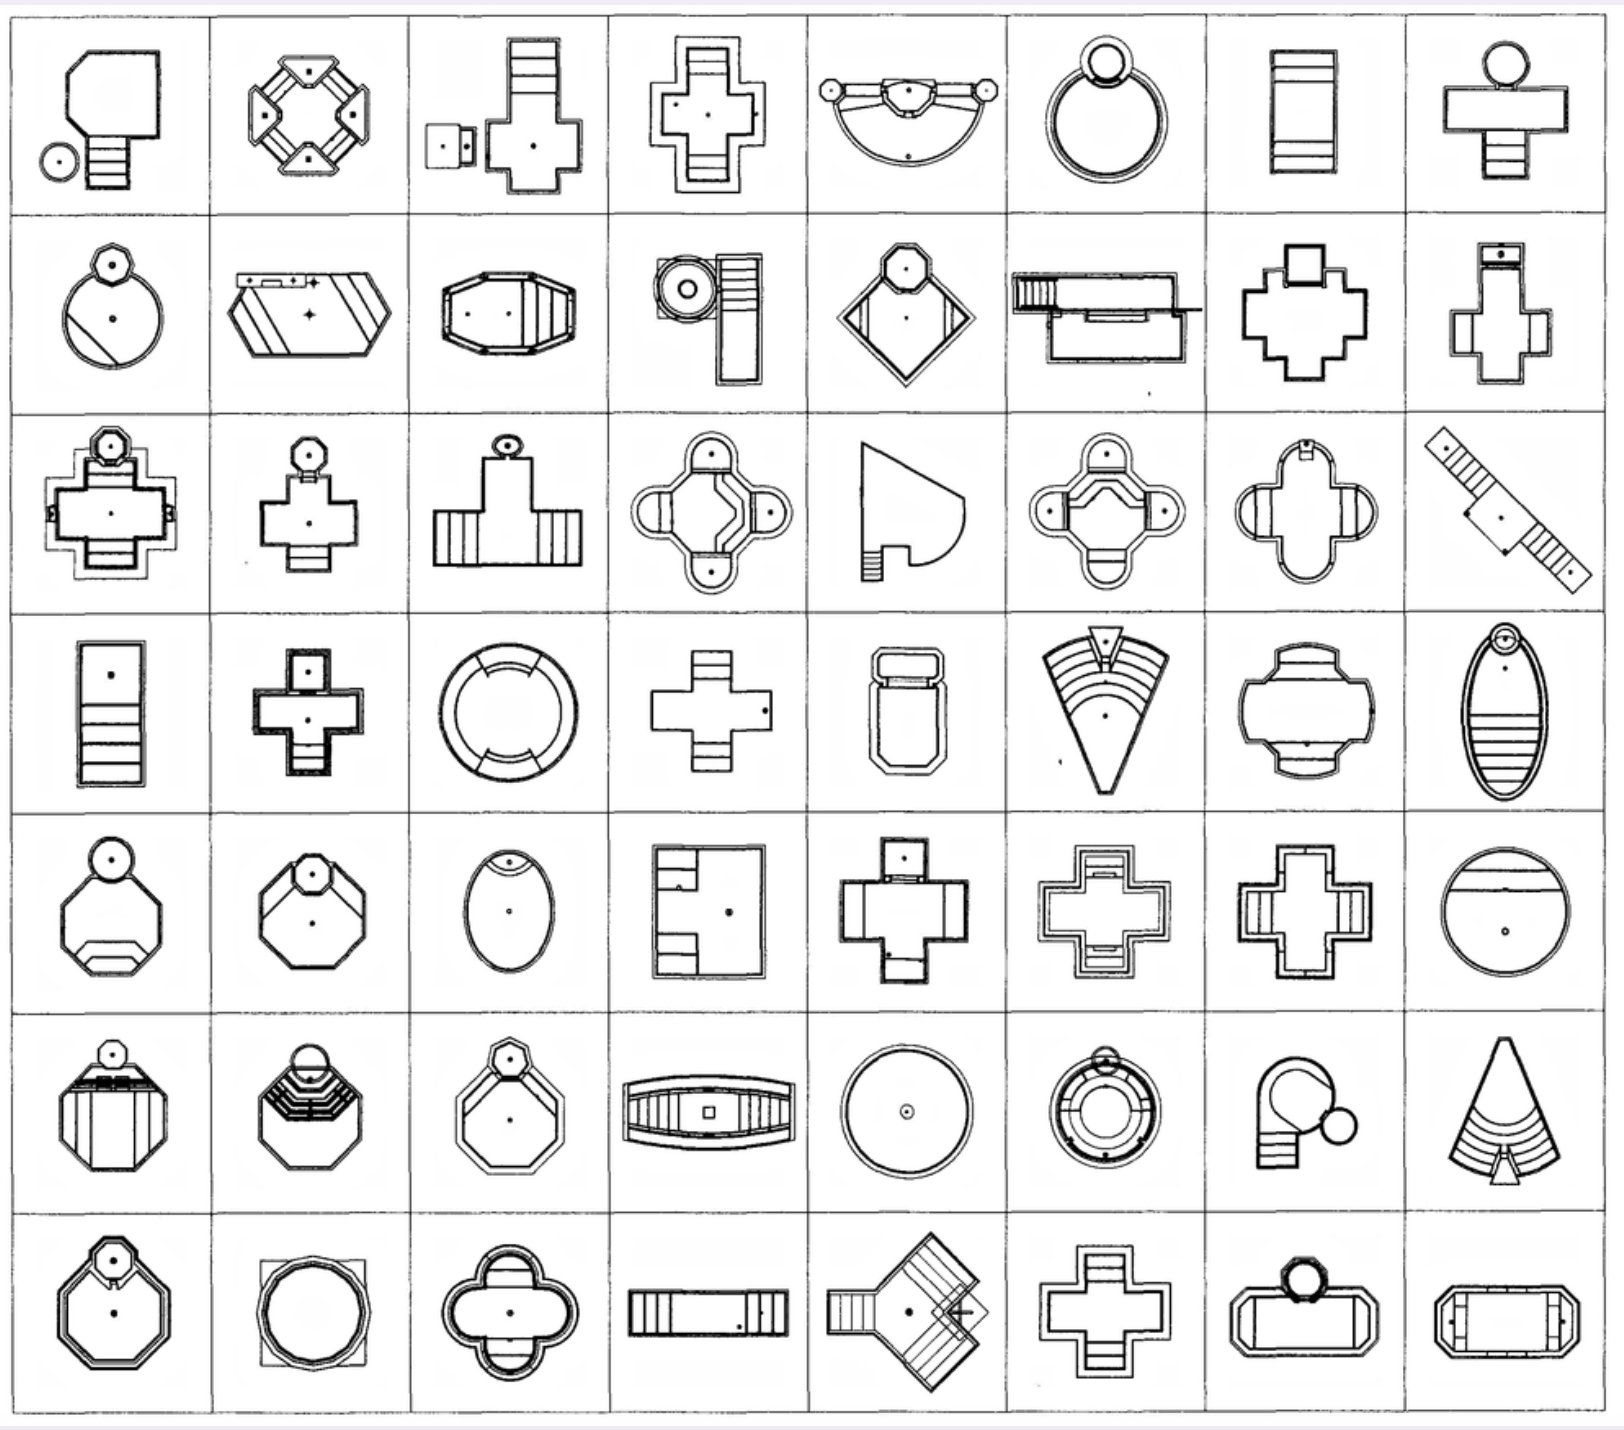 baptismal-fonts-assorted-custom-shell-designs